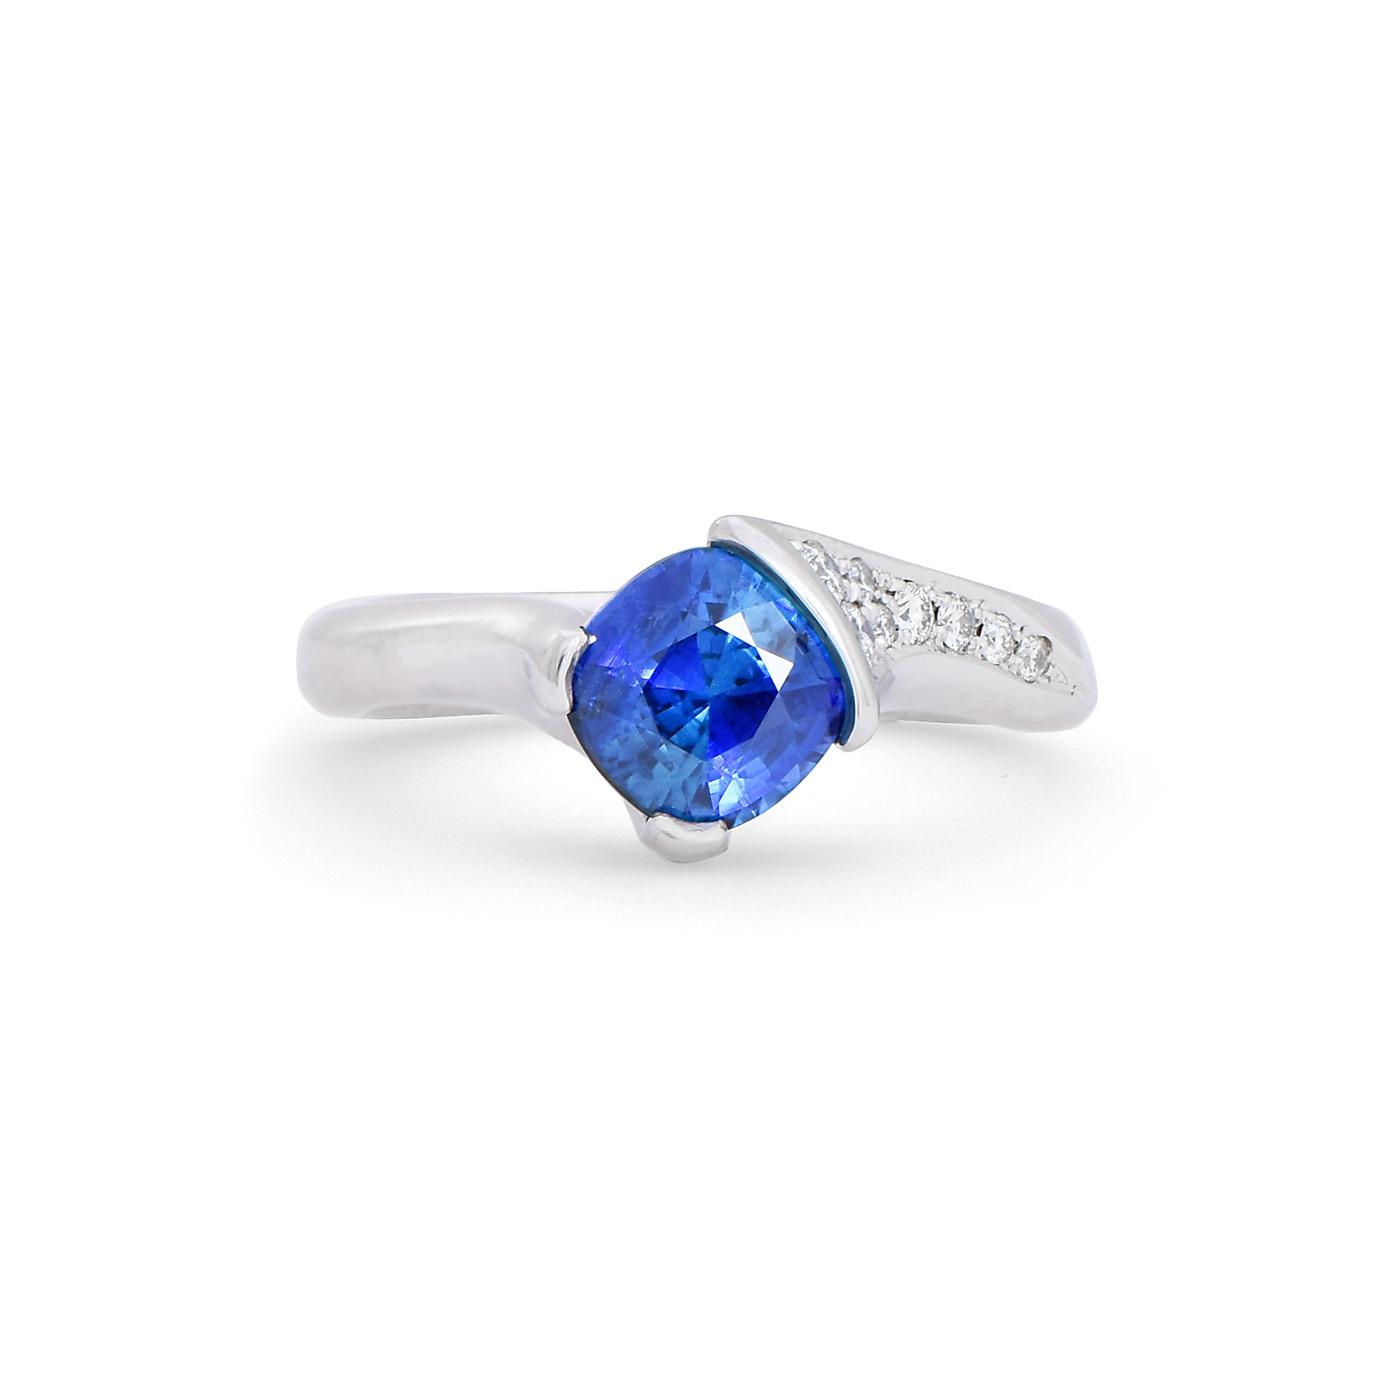 Cushion cut sapphire engagement ring dejonghe original for Sapphire studios jewelry reviews